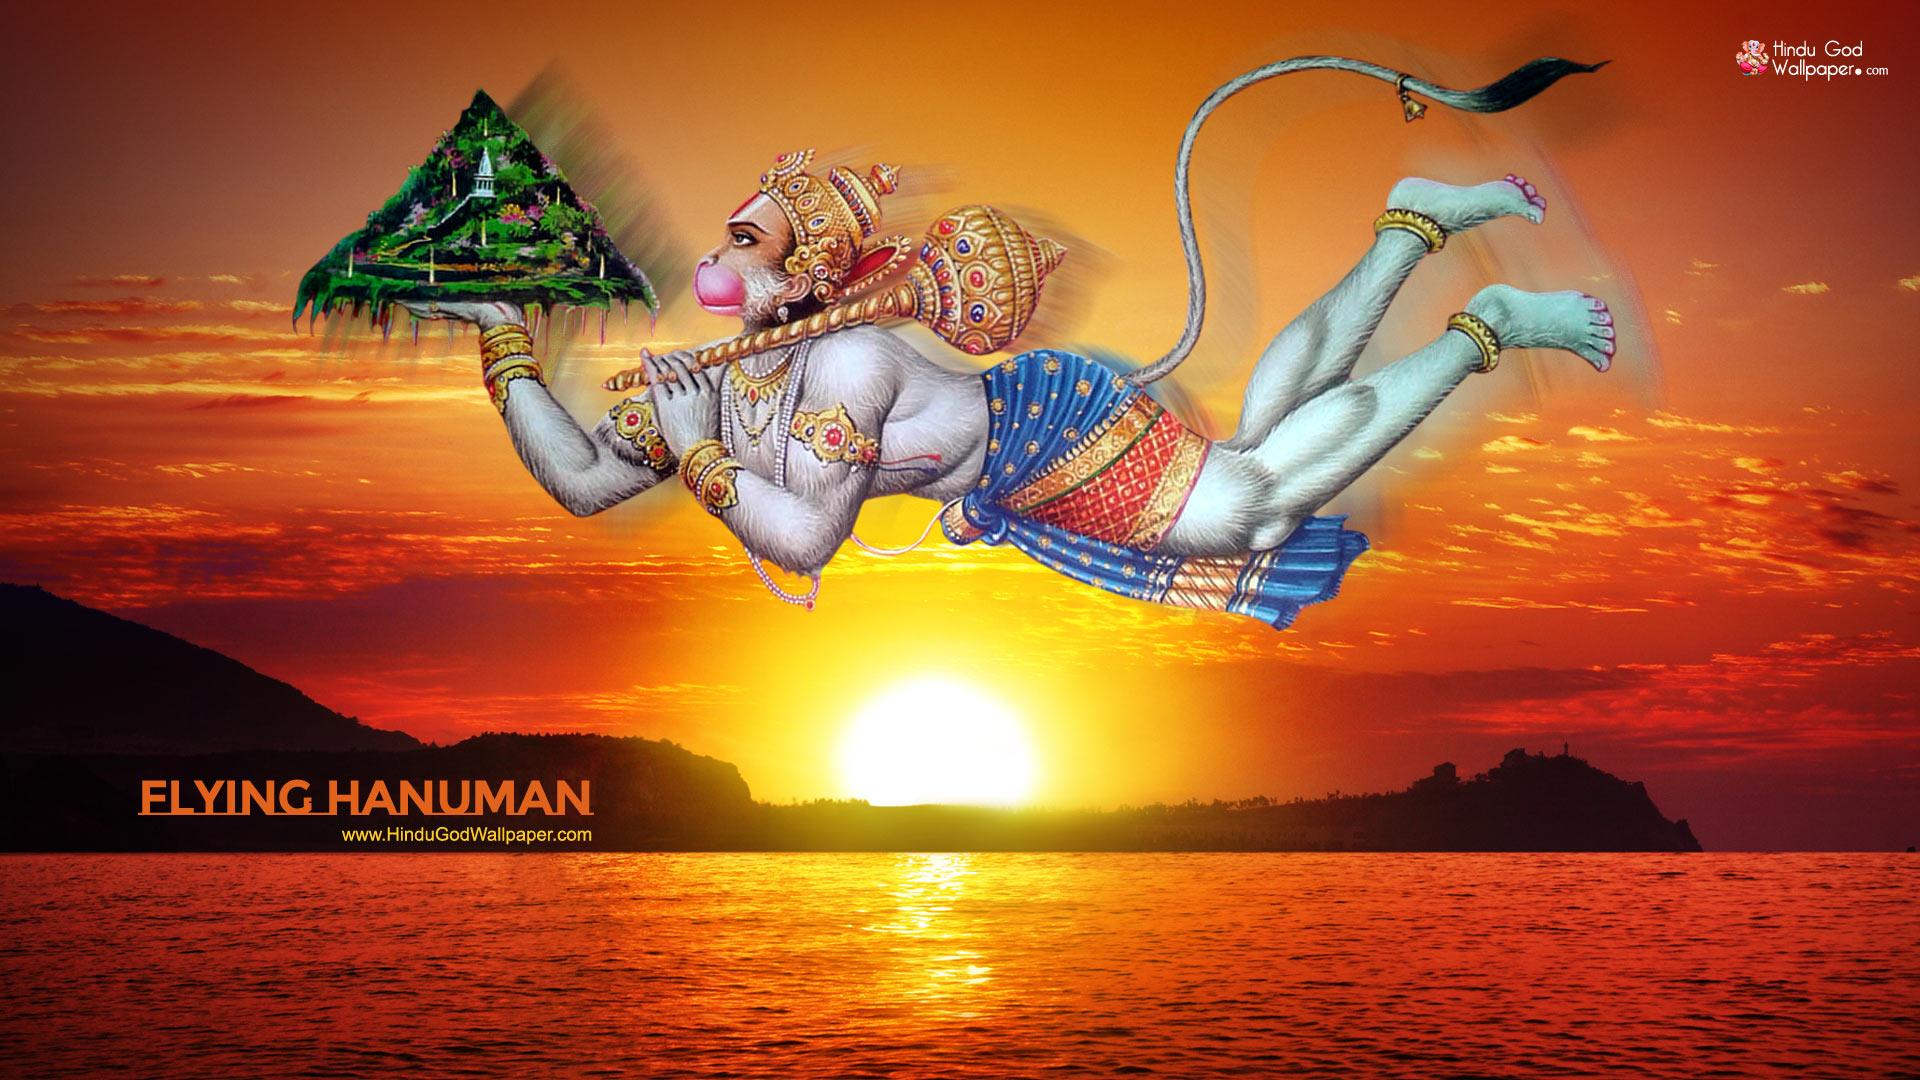 1080p Flying Hanuman Hd Wallpaper 1920x1080 Free Download